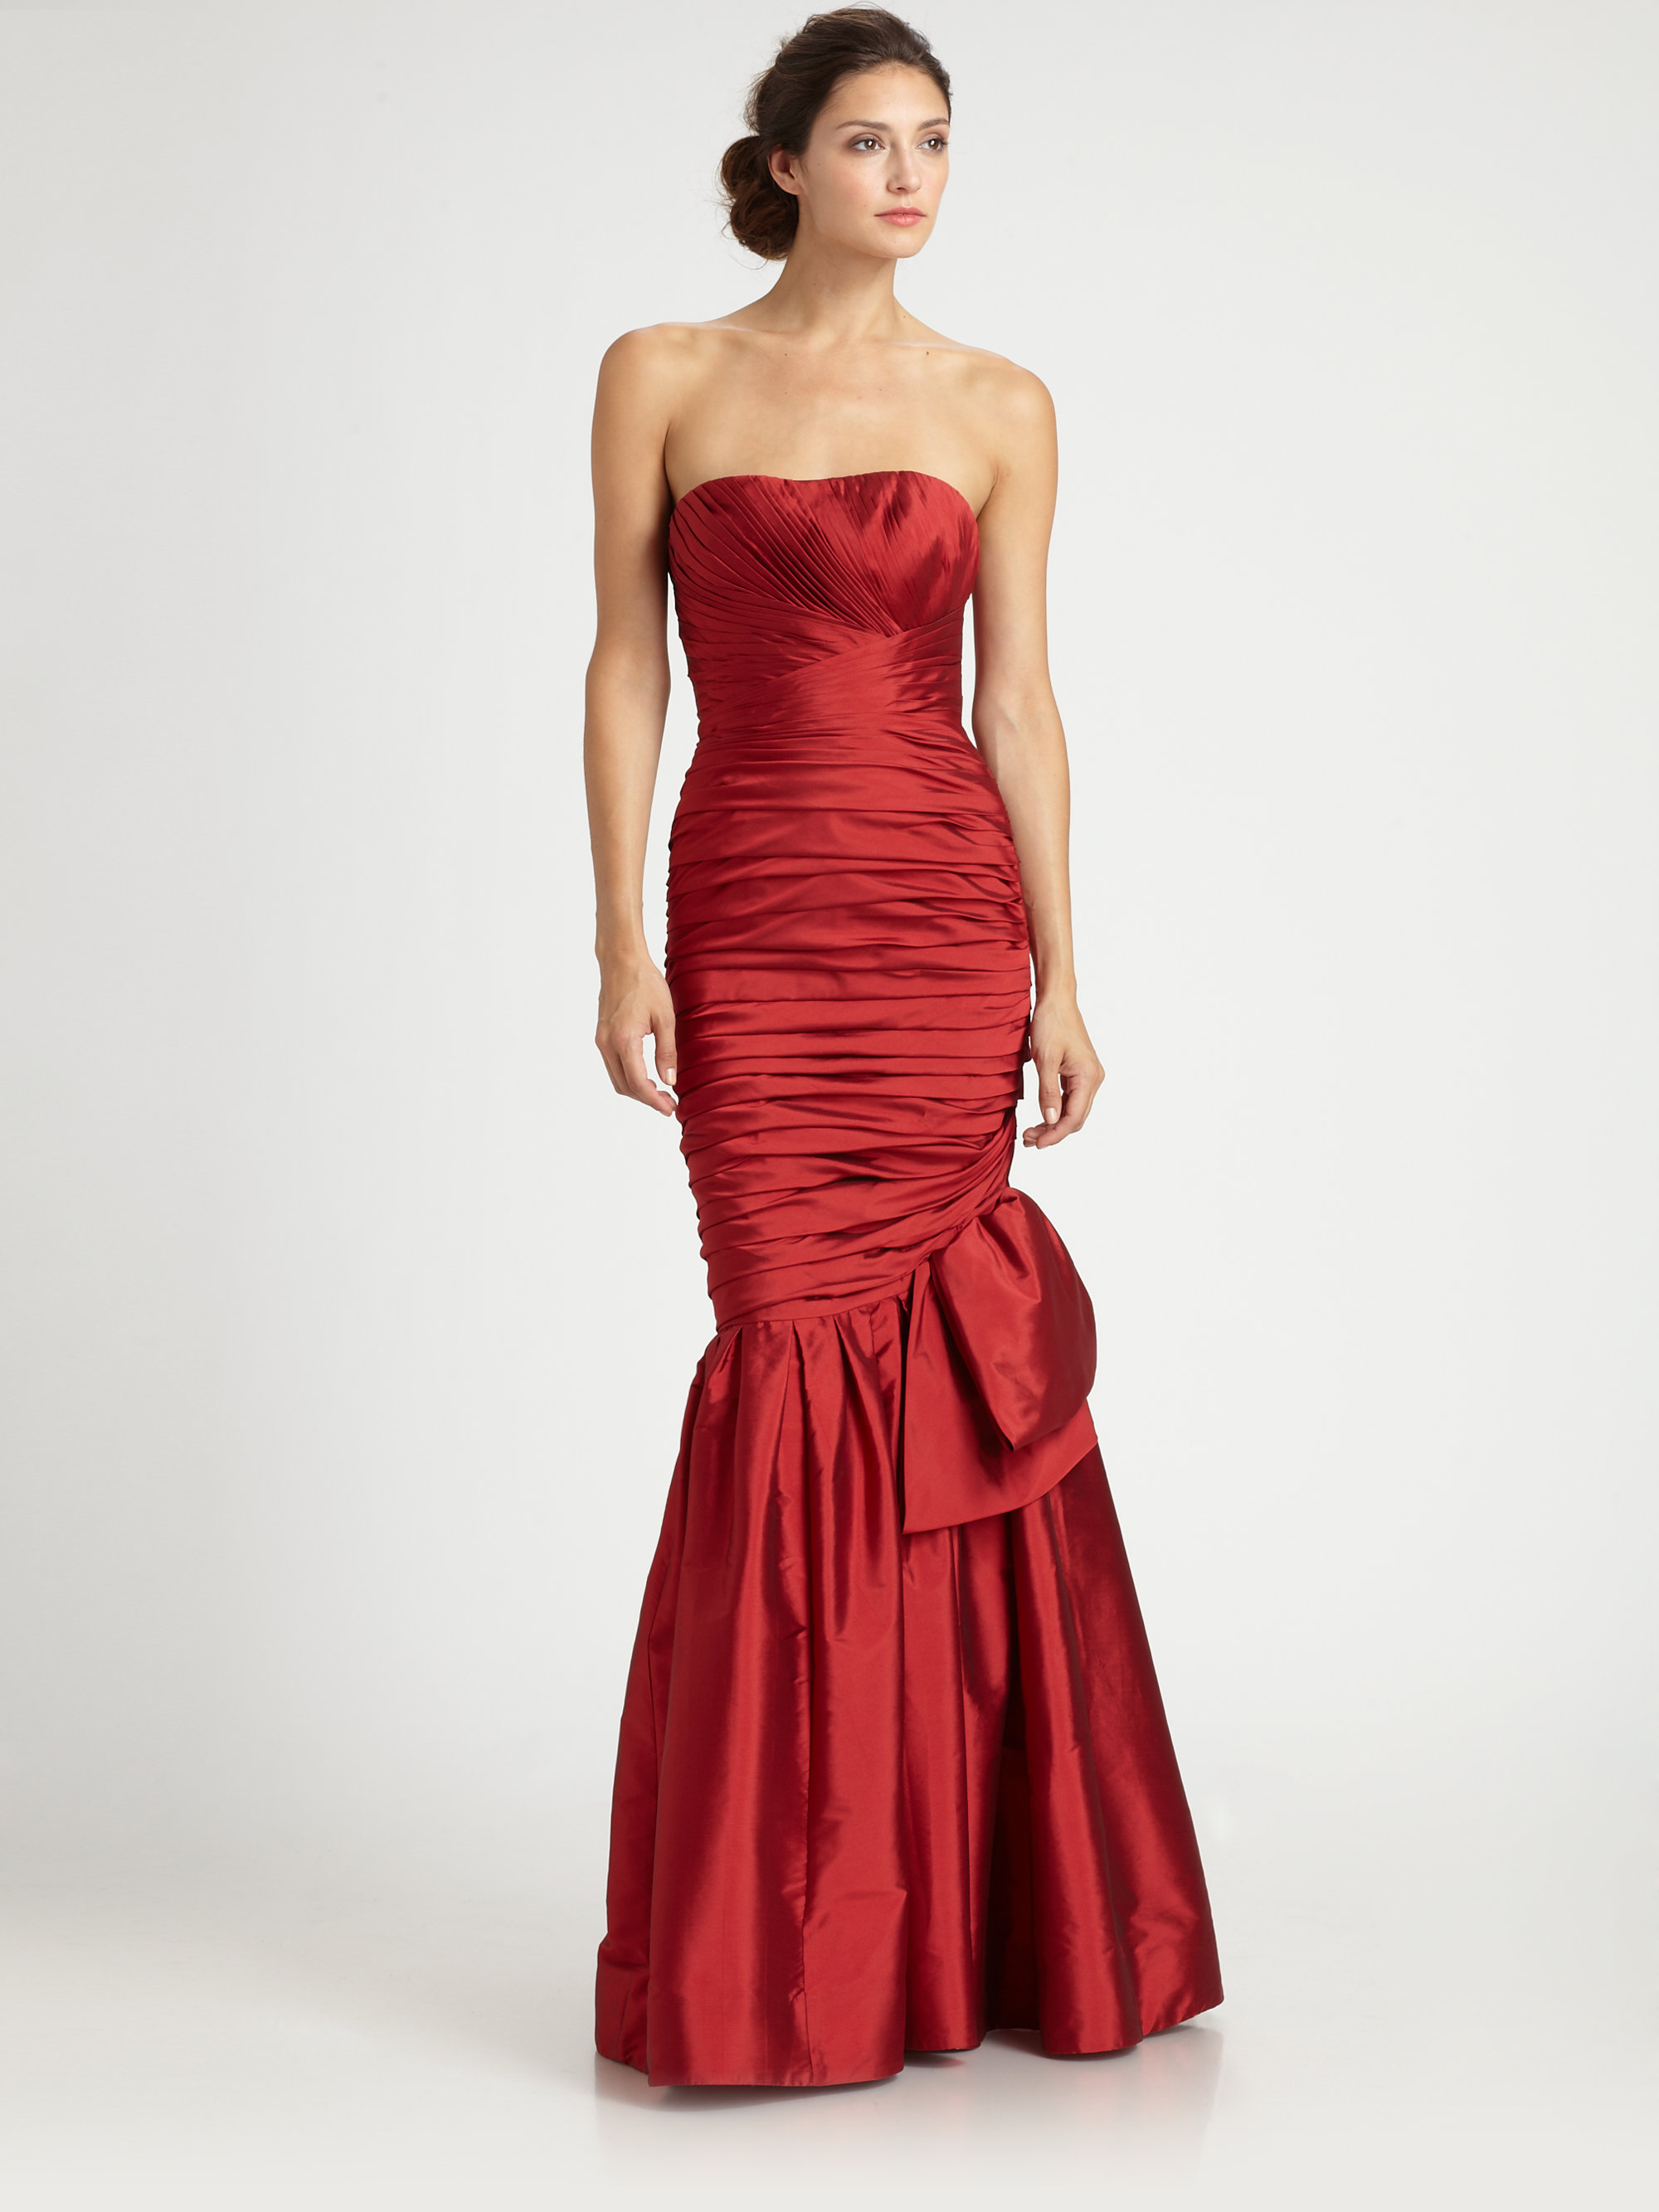 Ml Monique Lhuillier Trumpetskirt Gown in Red scarlet  Lyst